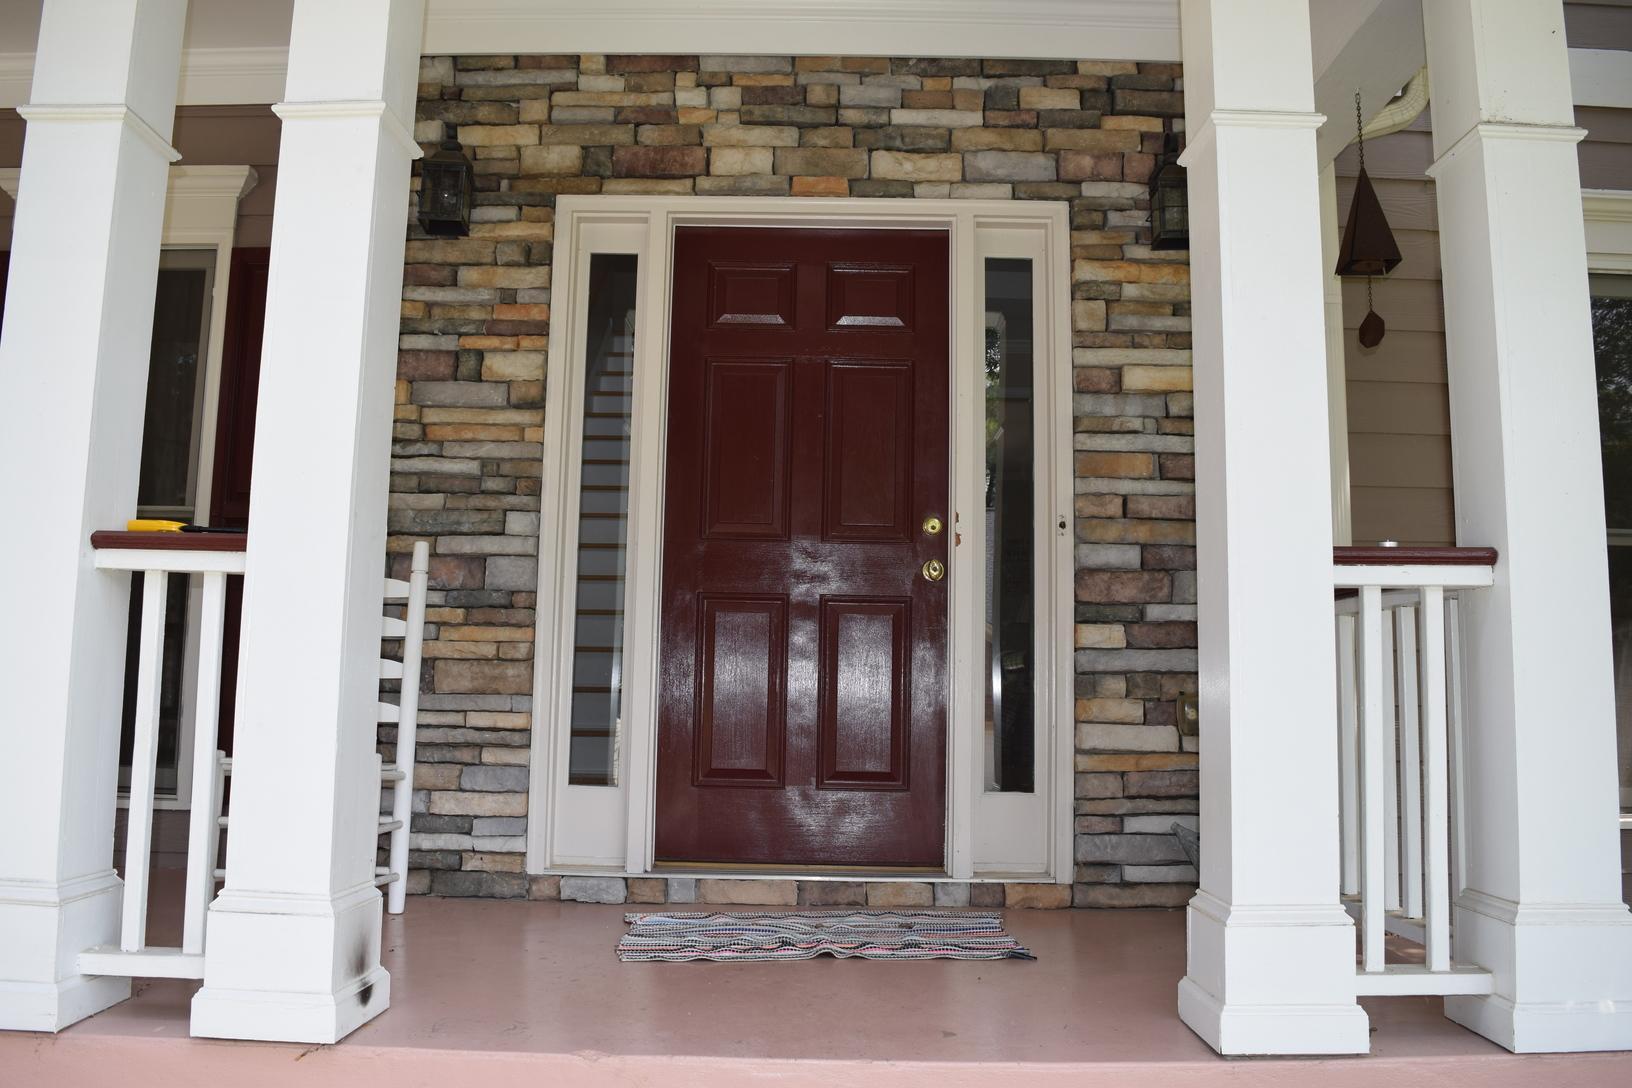 Woodstock Entry Door Conversion - Before Photo